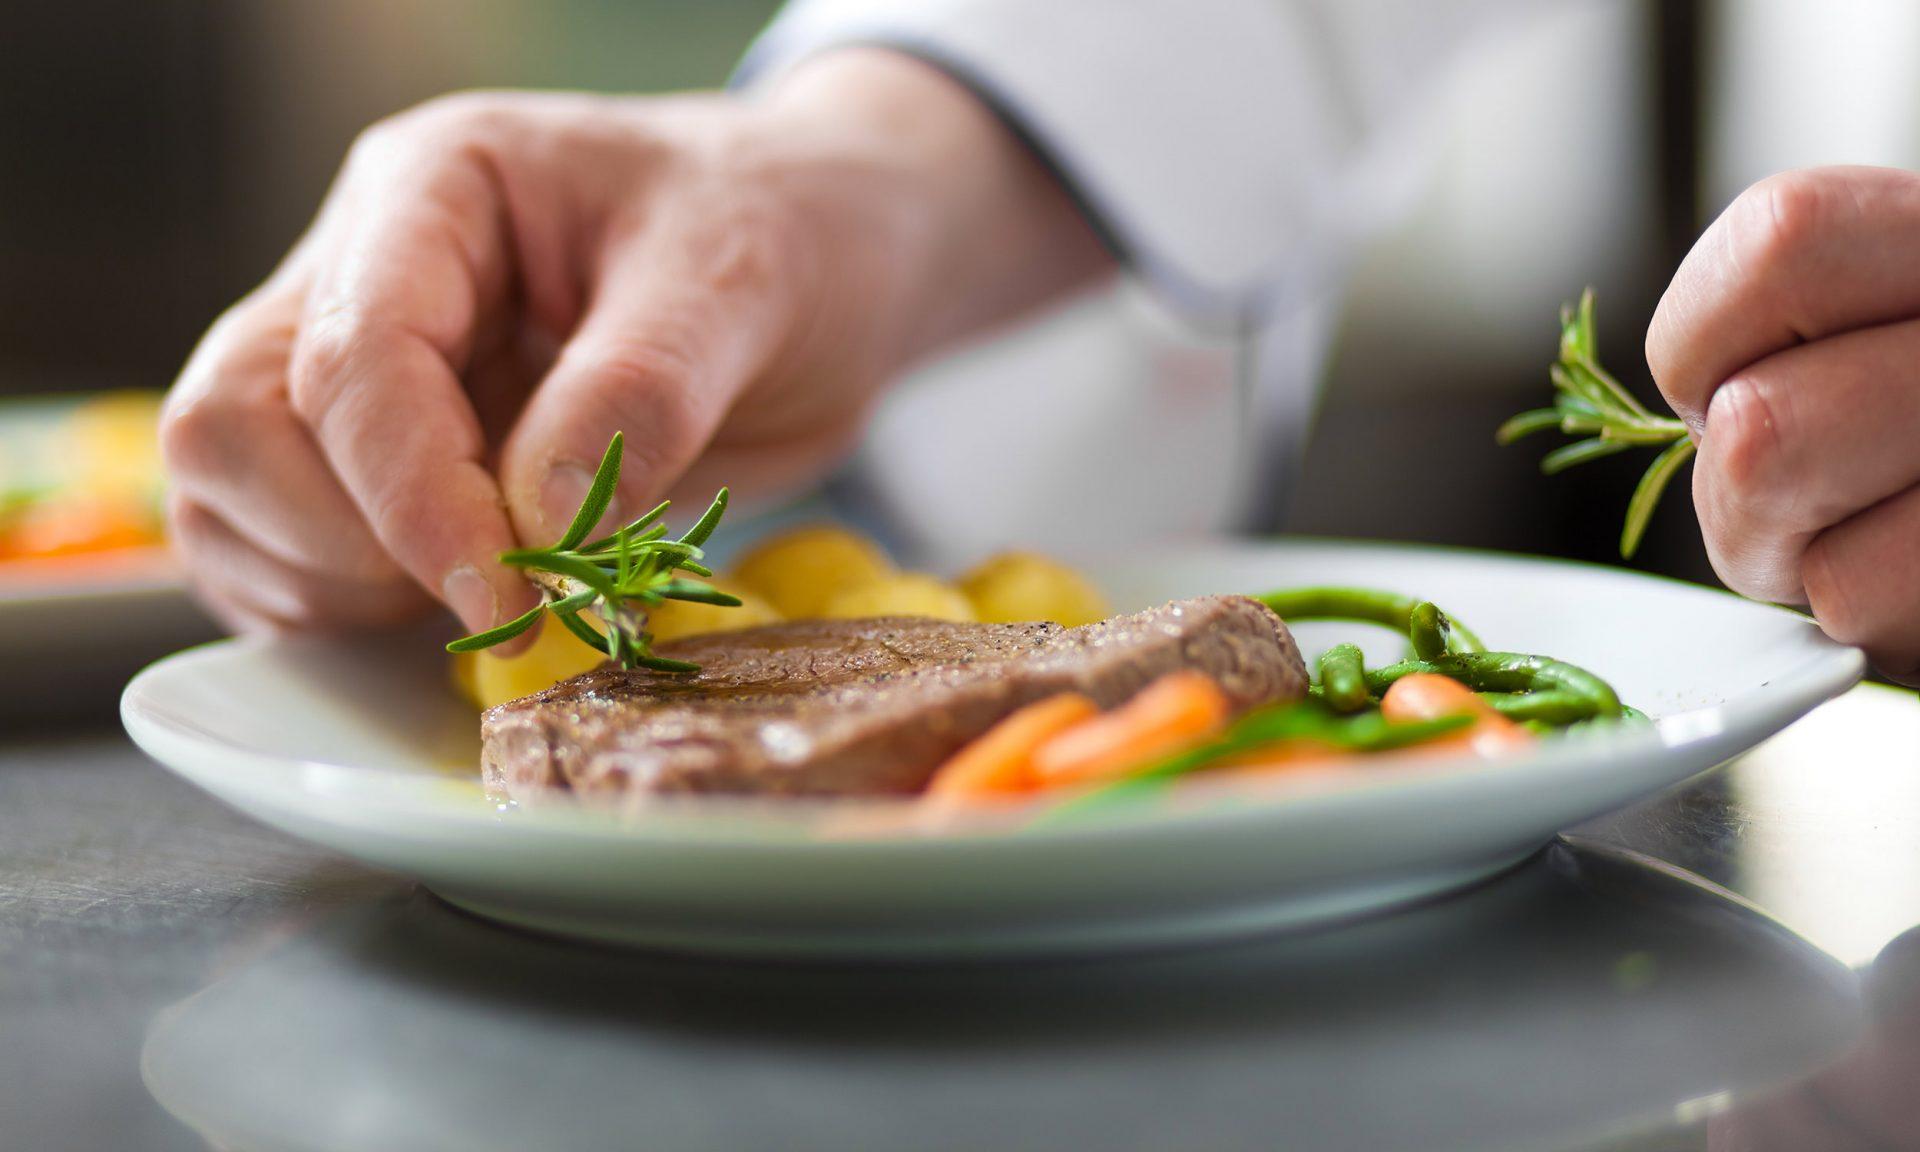 Foodstyling: Darauf kommt's an